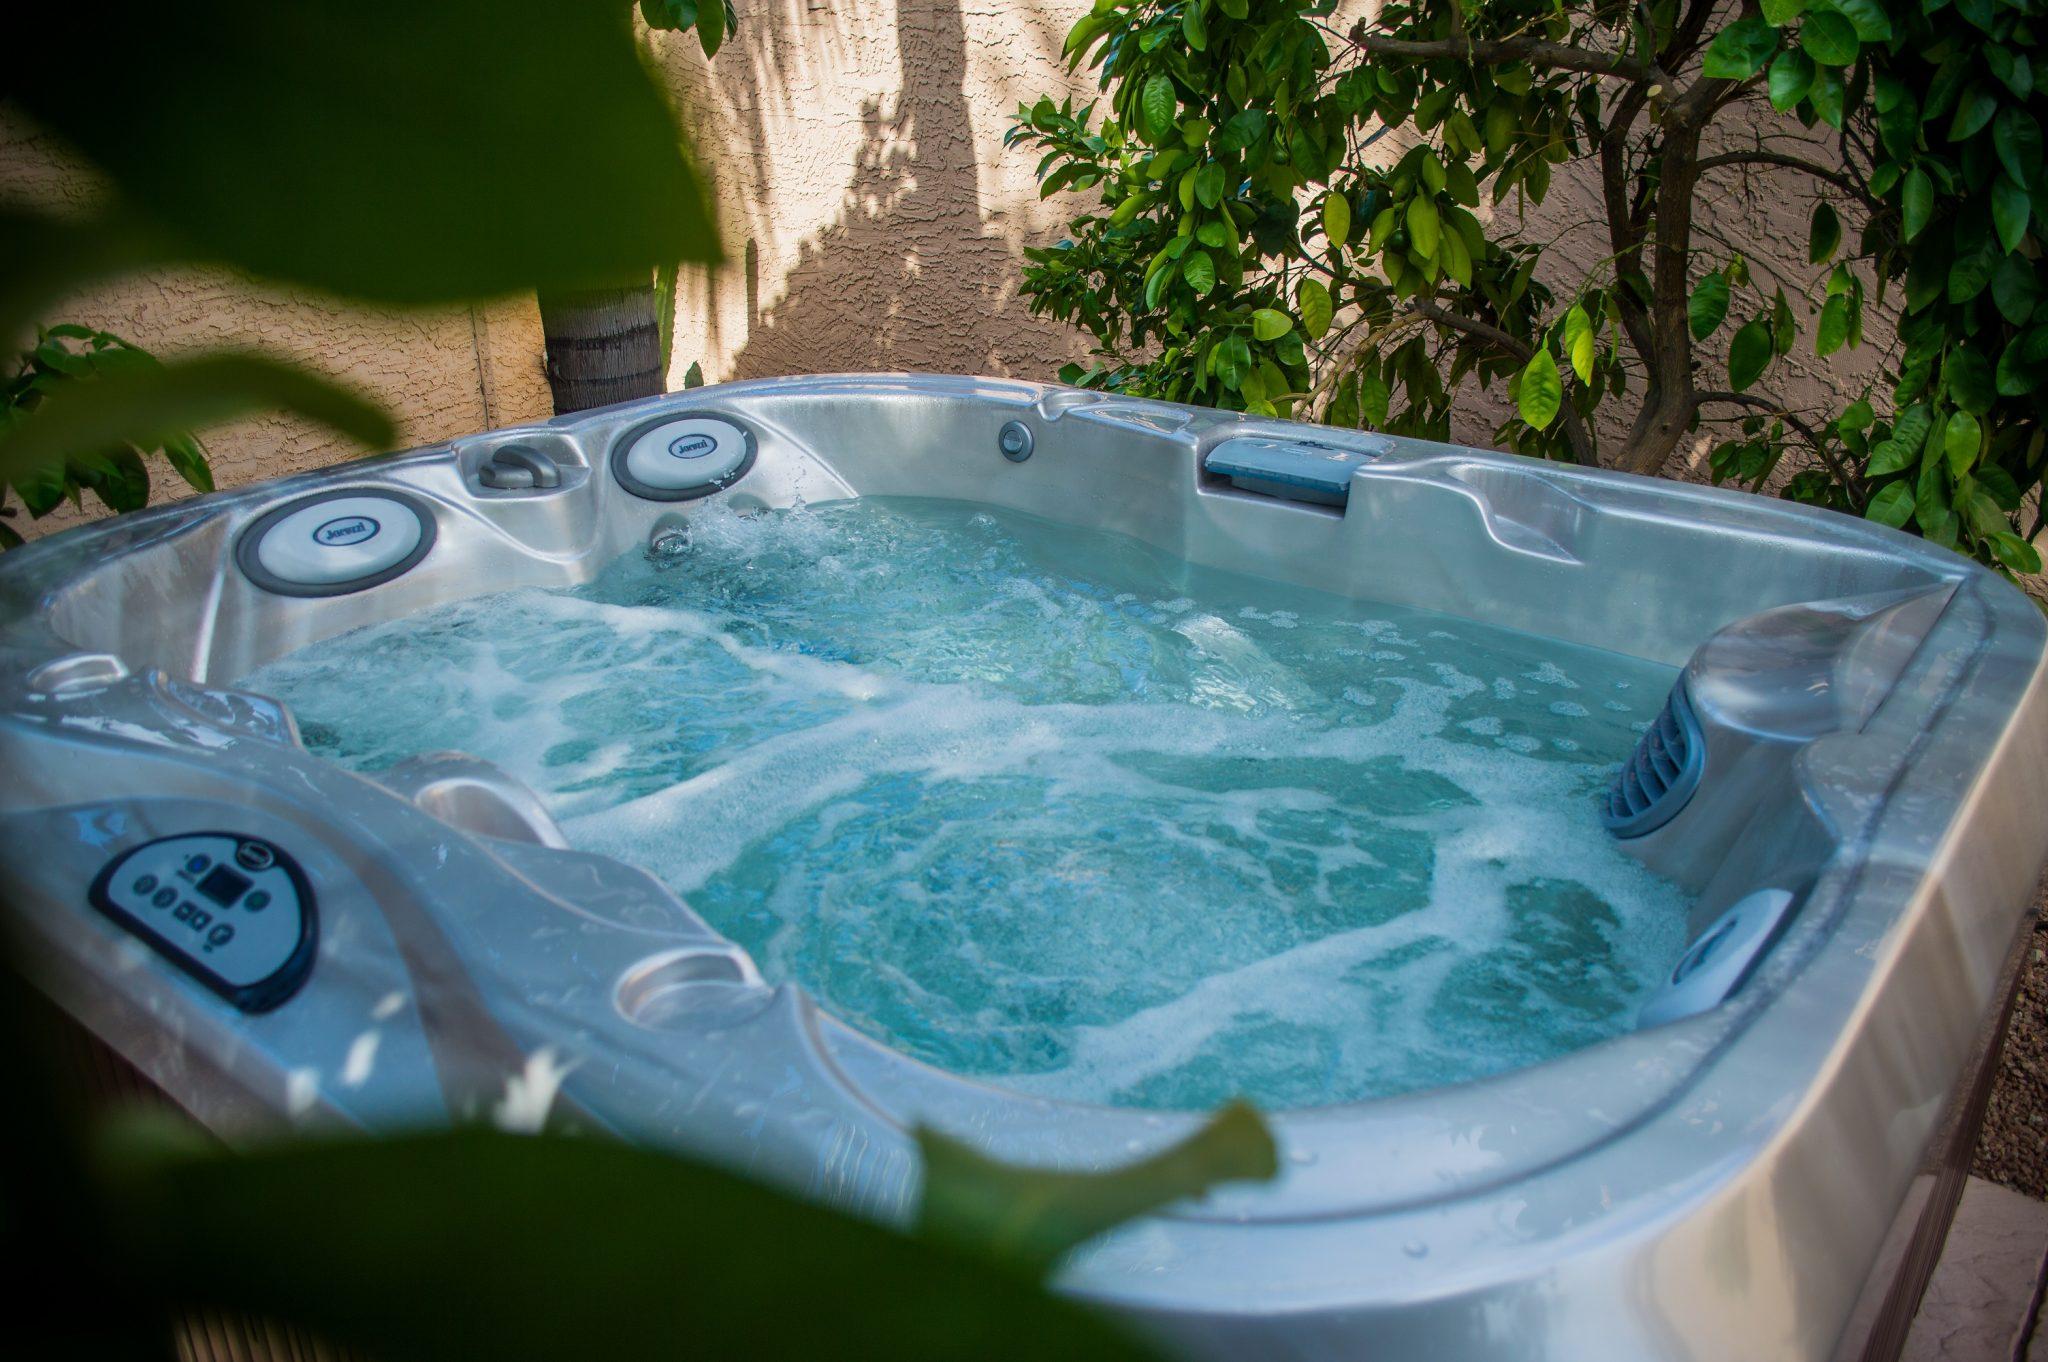 Outdoor Jacuzzi Hot Tub in Hurricane, Utah